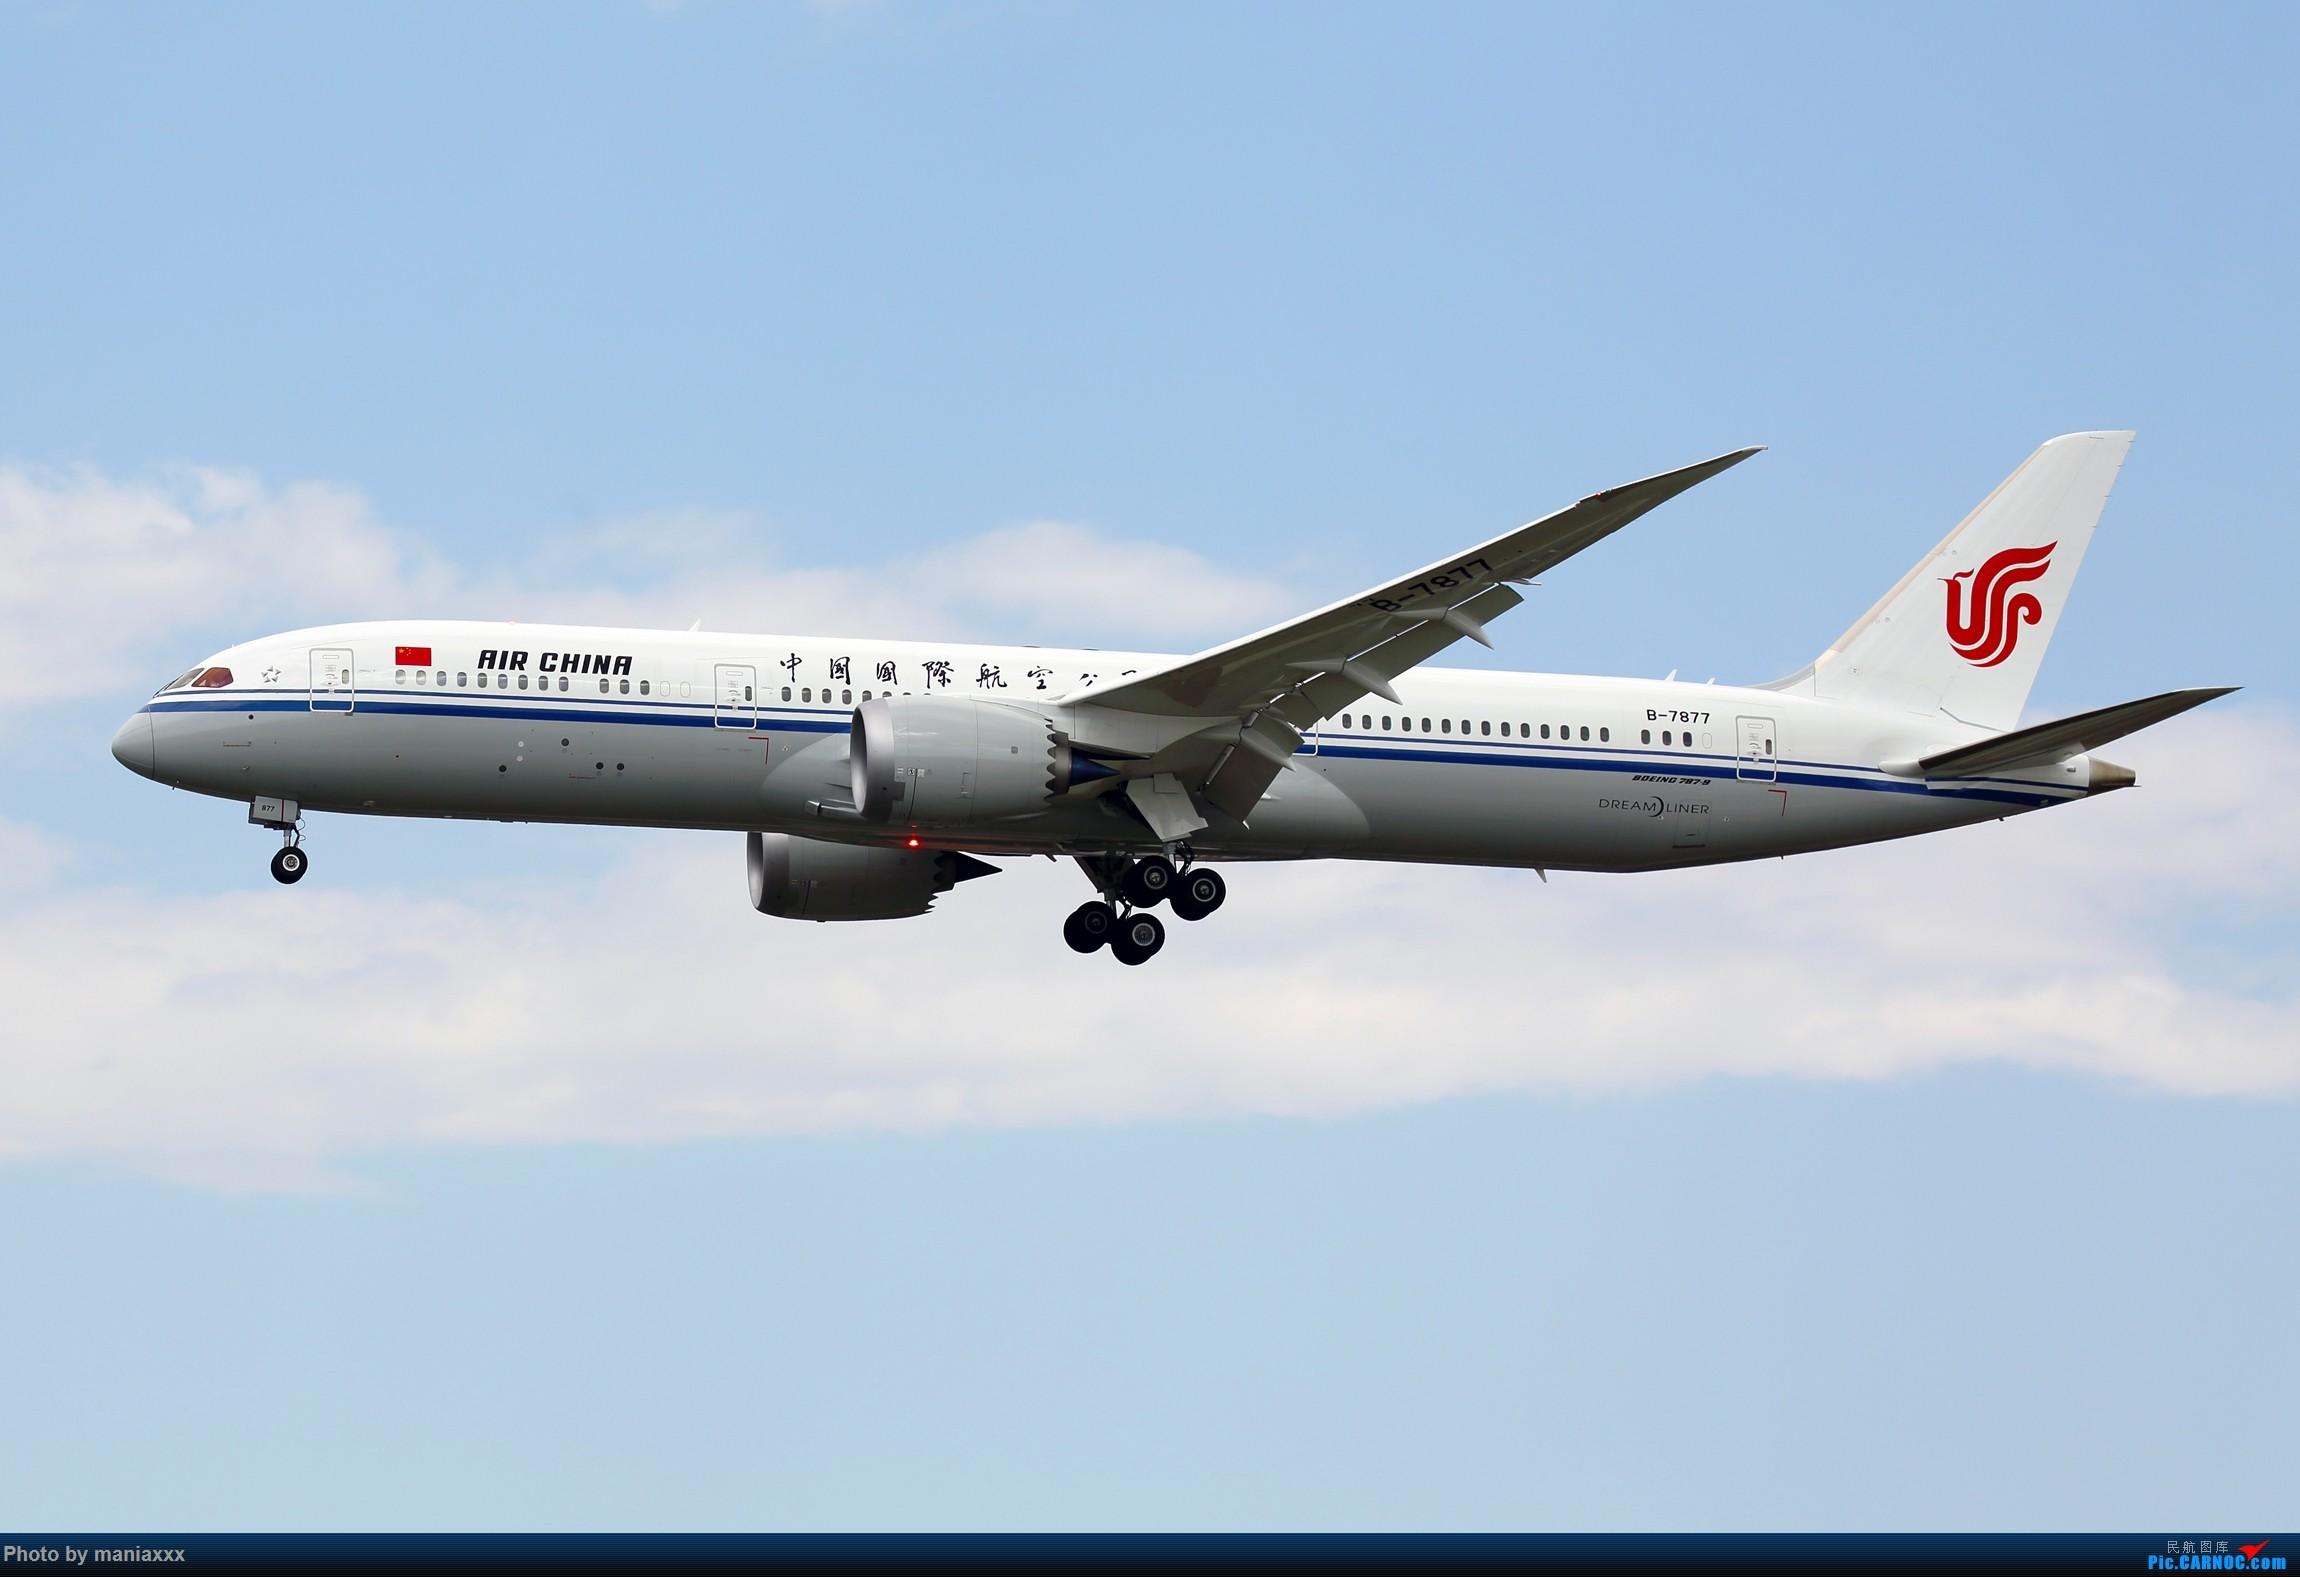 789re_re:[原创]国航第二架789~~b-7878~~欢迎回家~~~~p.s.